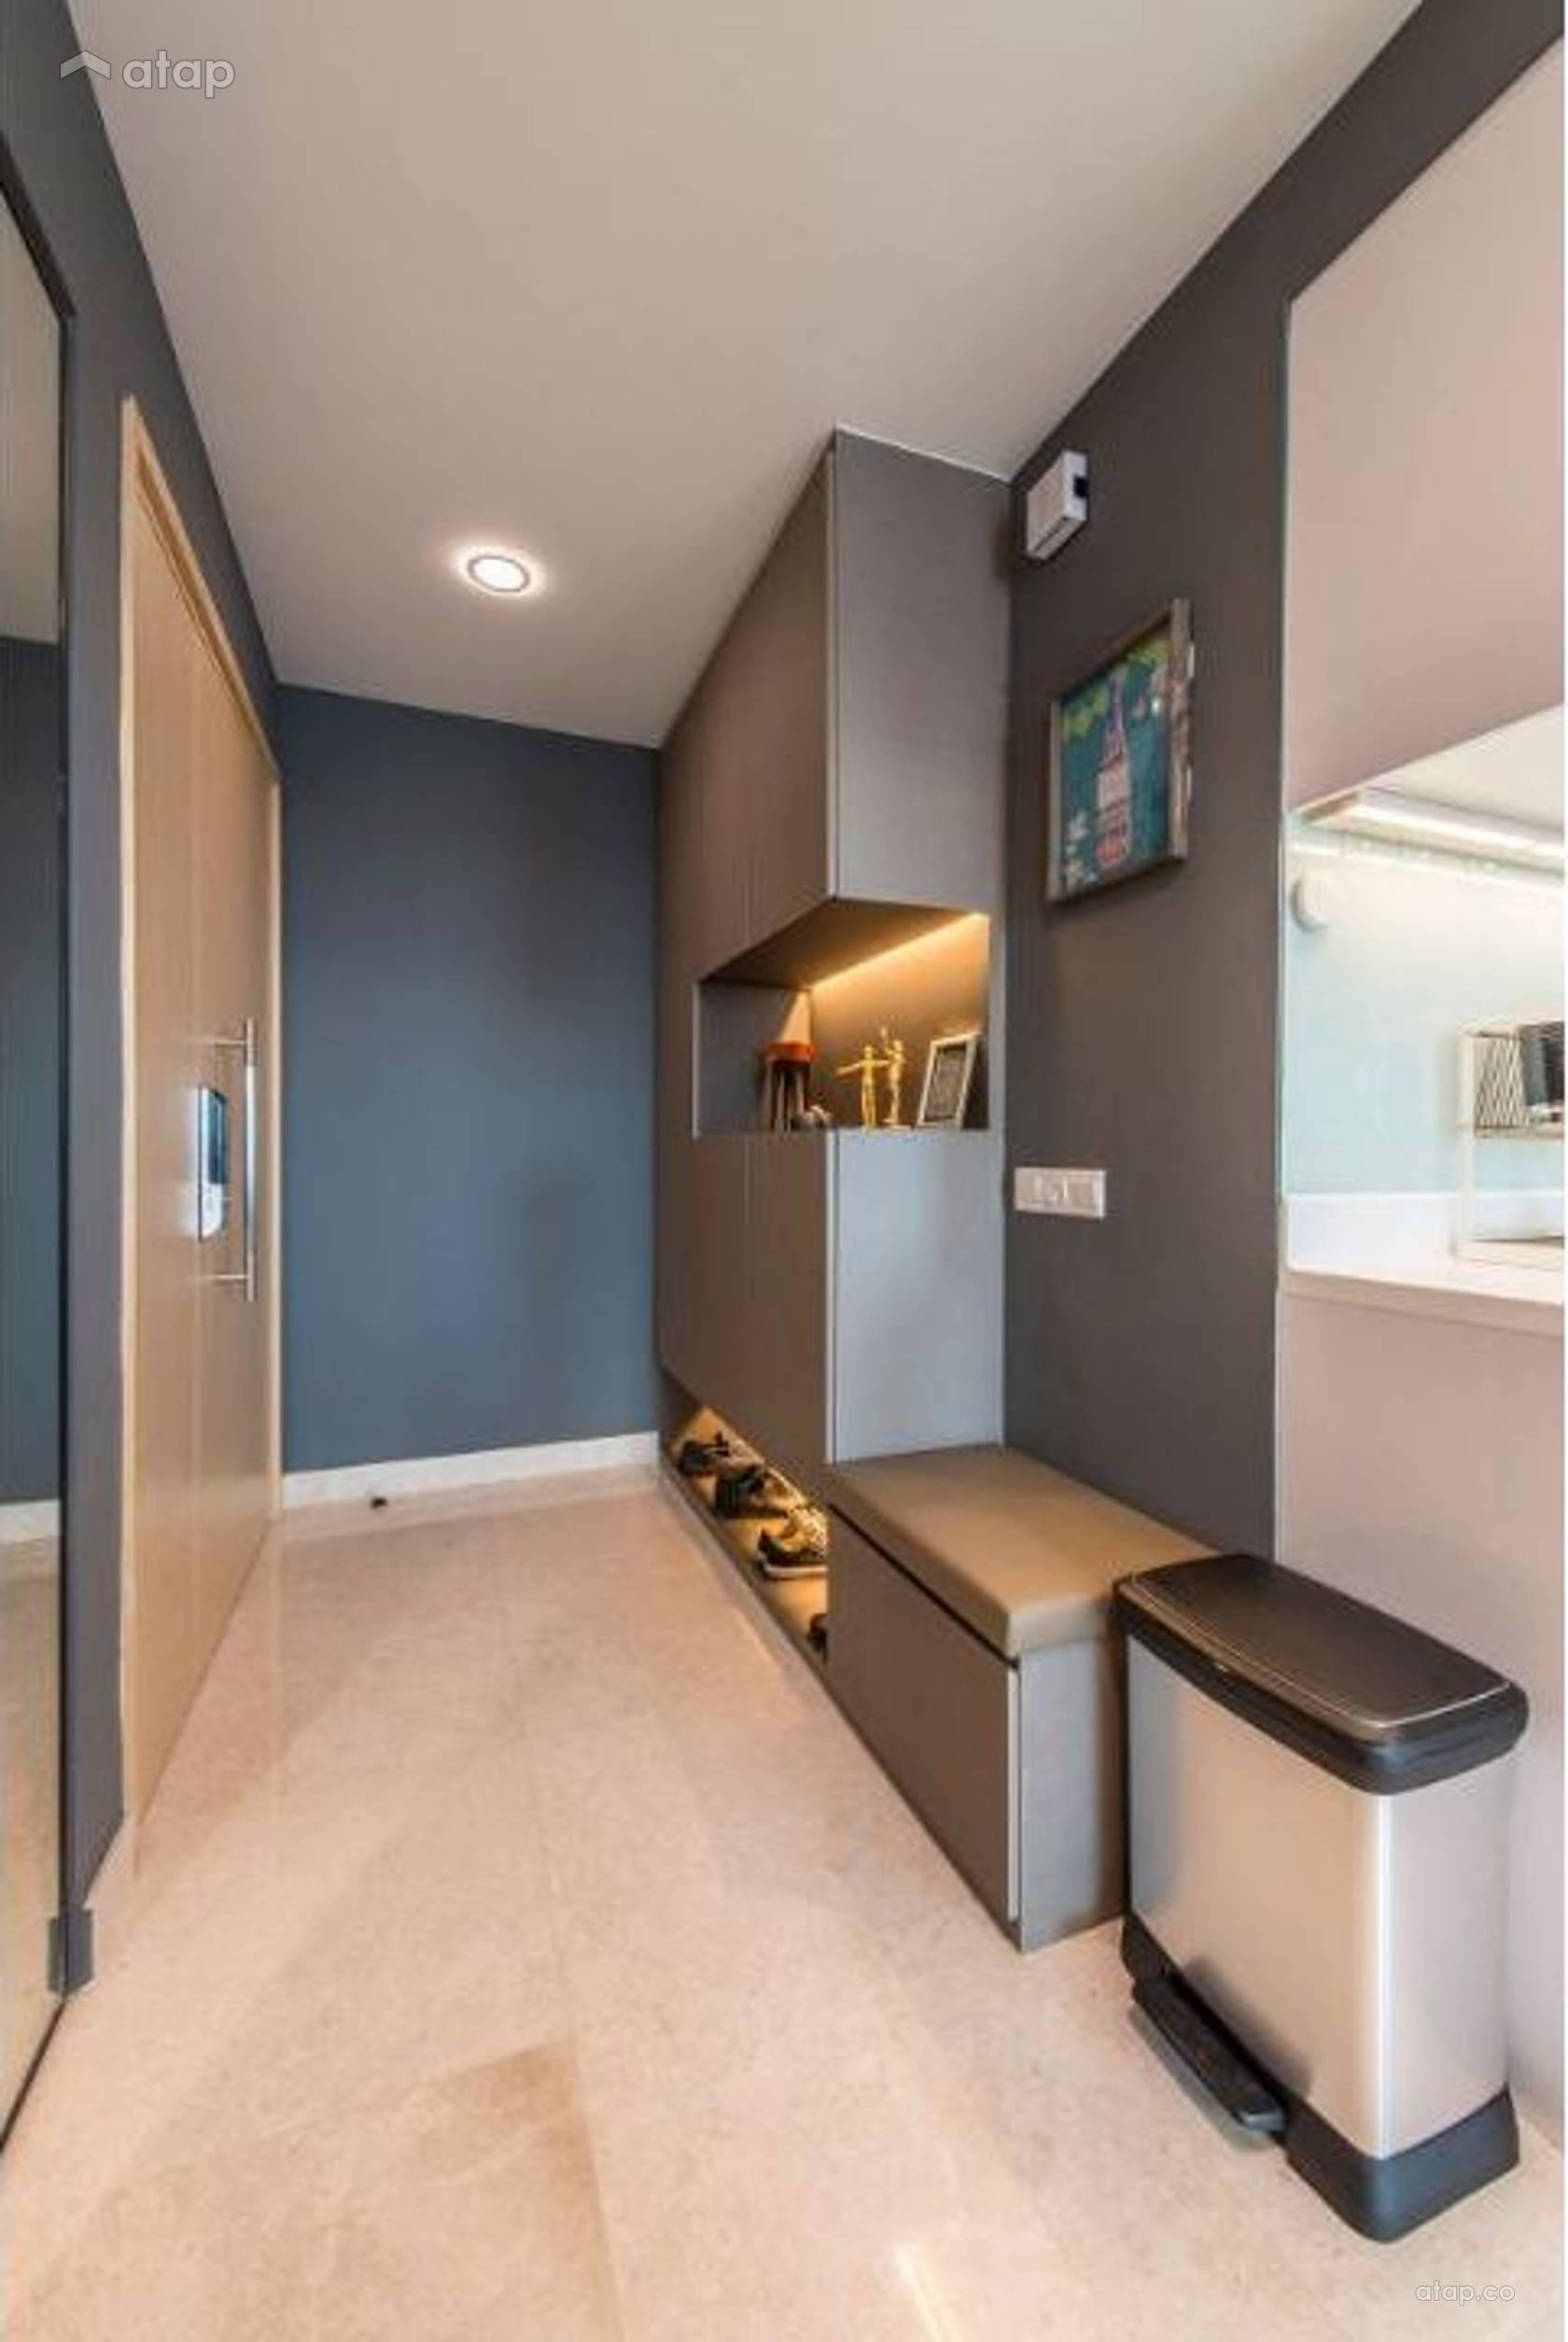 contemporary condo interior design renovation ideas photos and 1 8